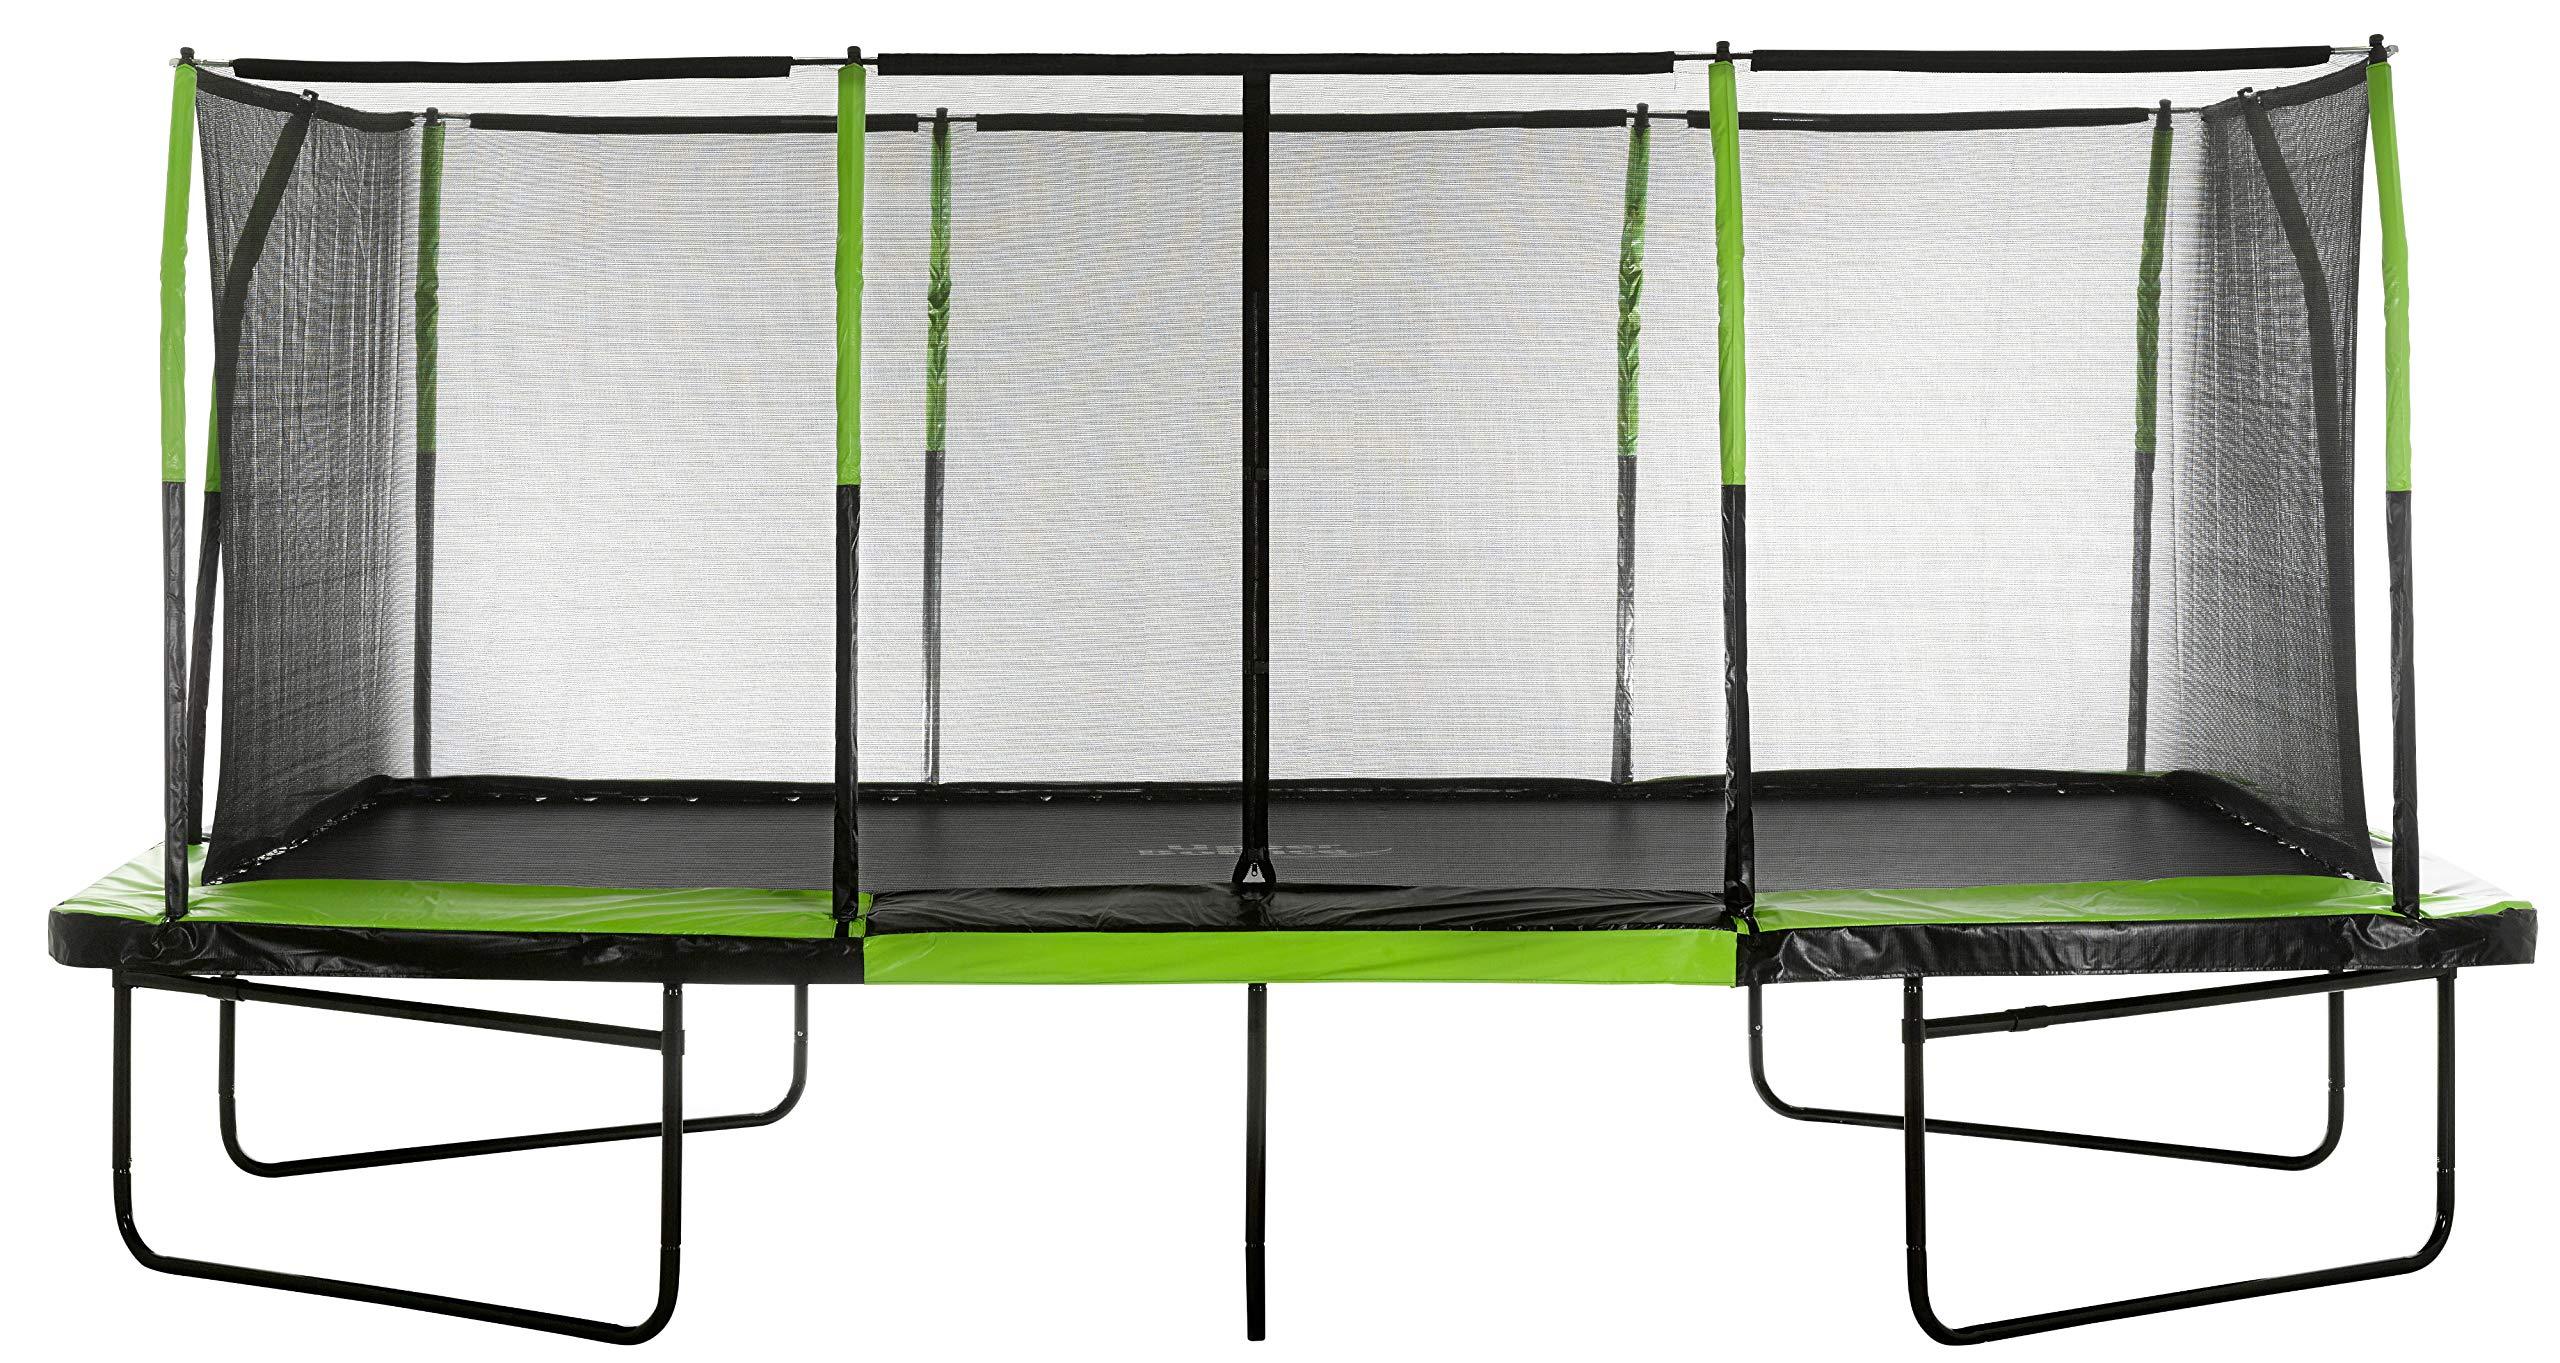 Upper Bounce UBRTG01-1017 - Mega Trampoline 10' x 17' - Fiber Flex Enclosure System - Easy Assemble by Upper Bounce